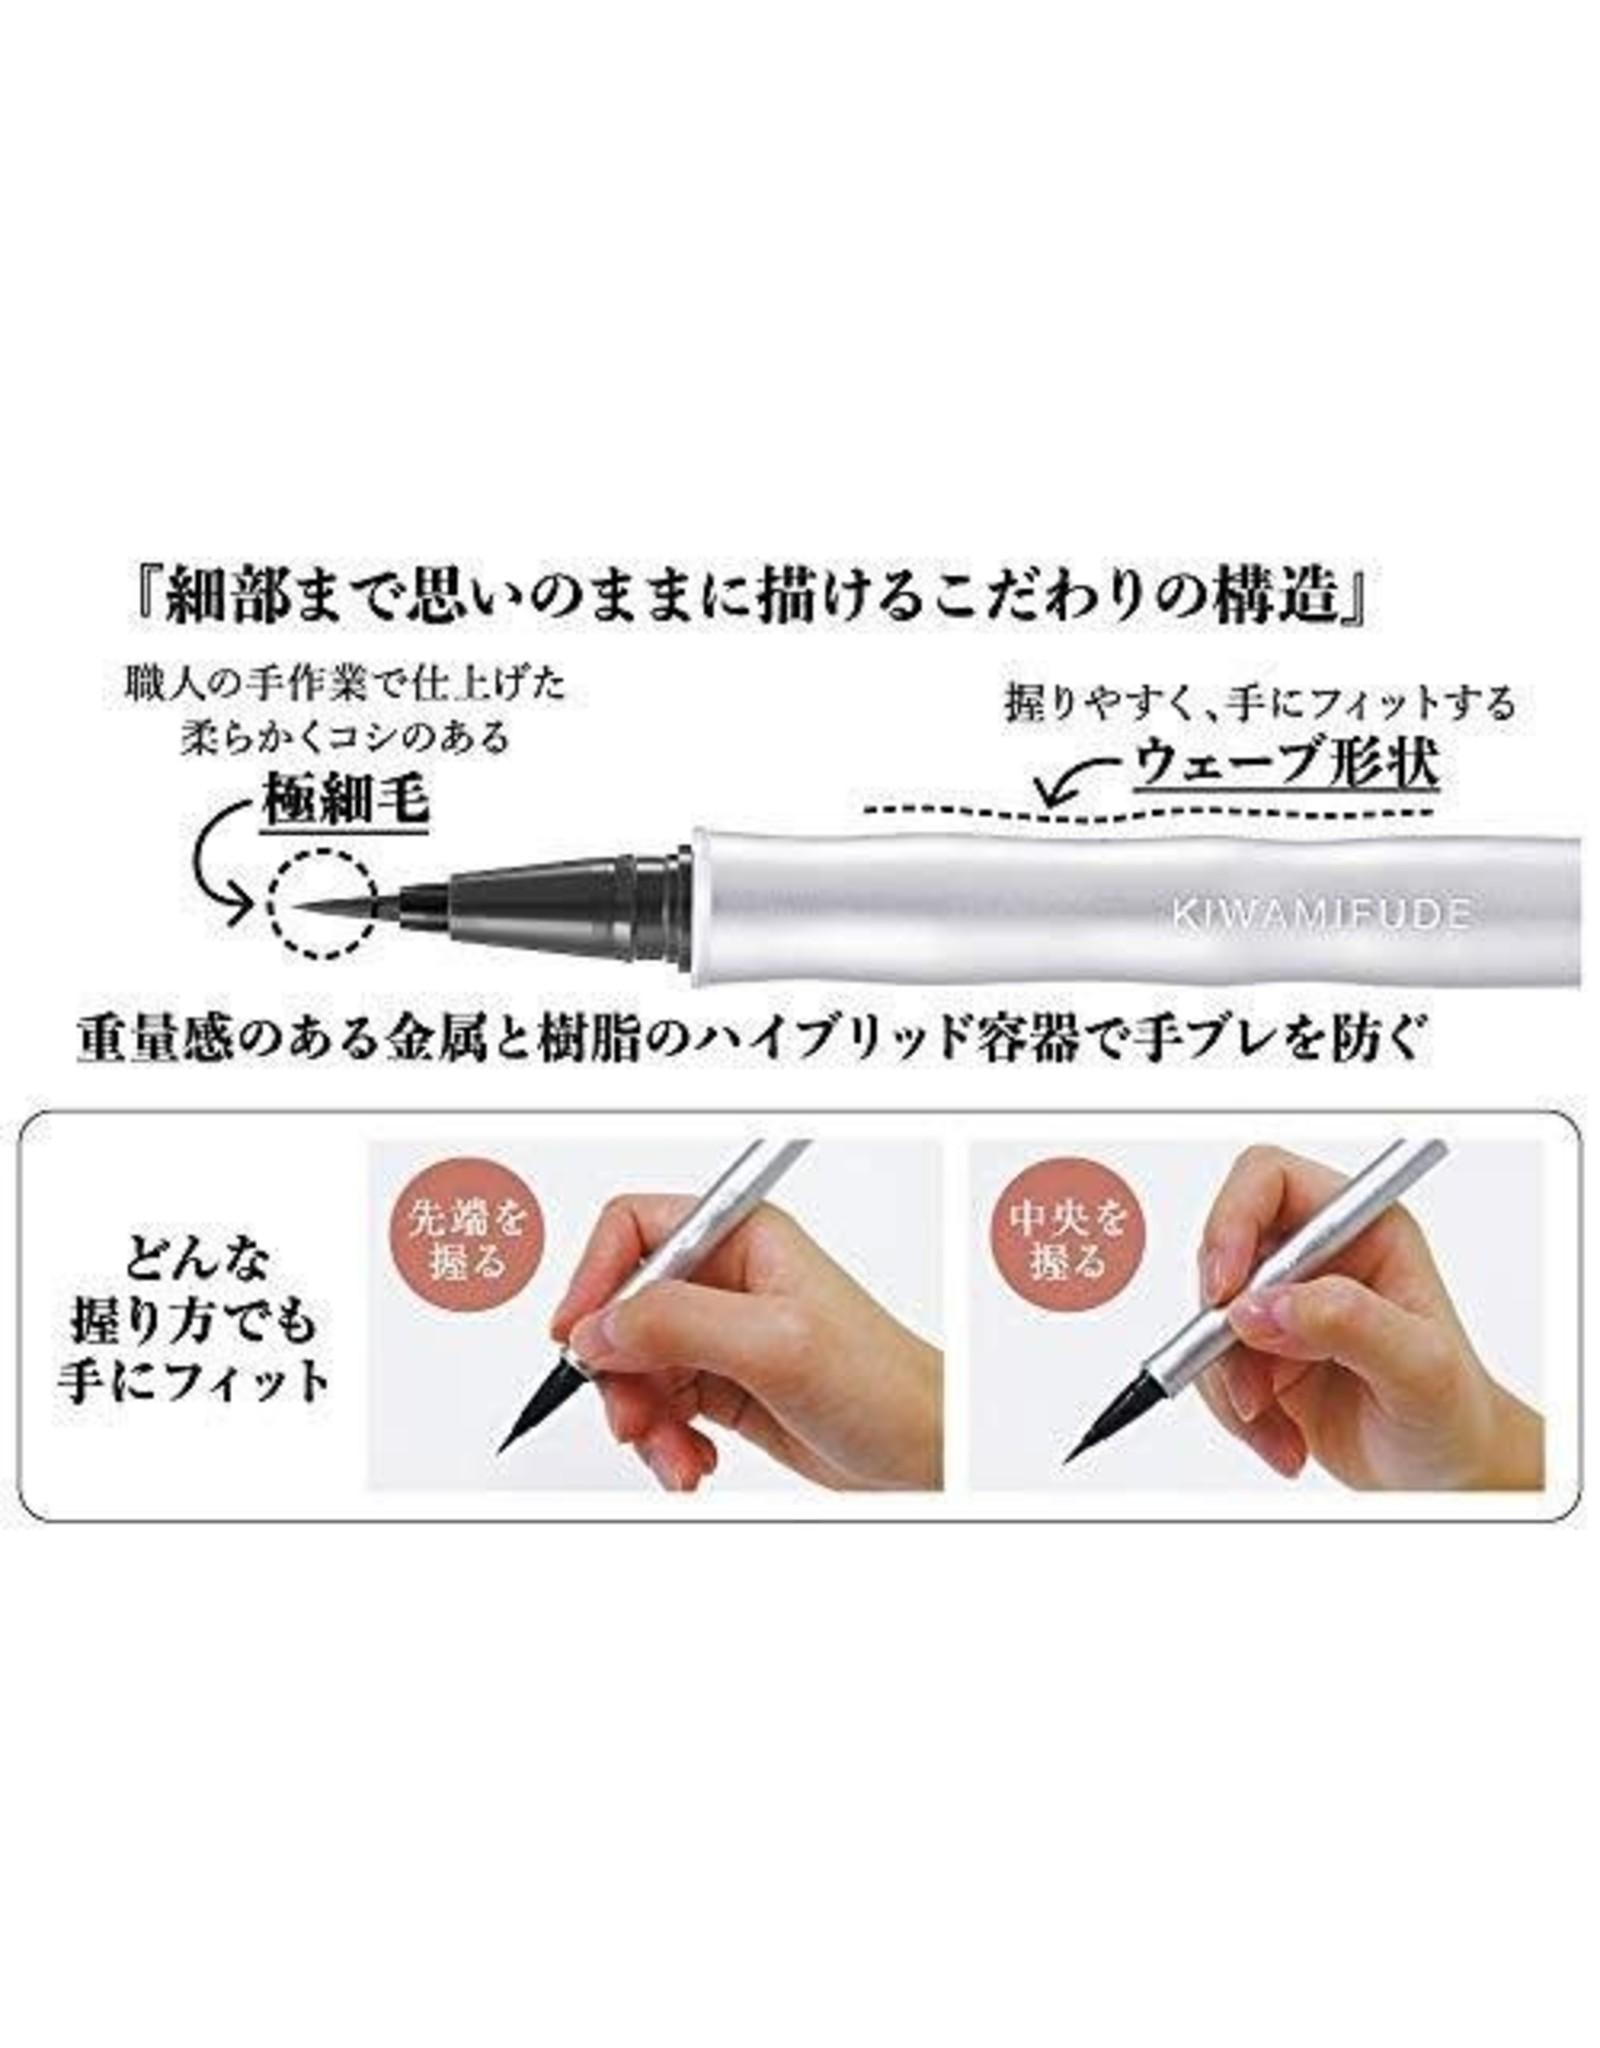 Koji KOJI Kiwami Fude Liquid Eyeliner - Chestnut Brown